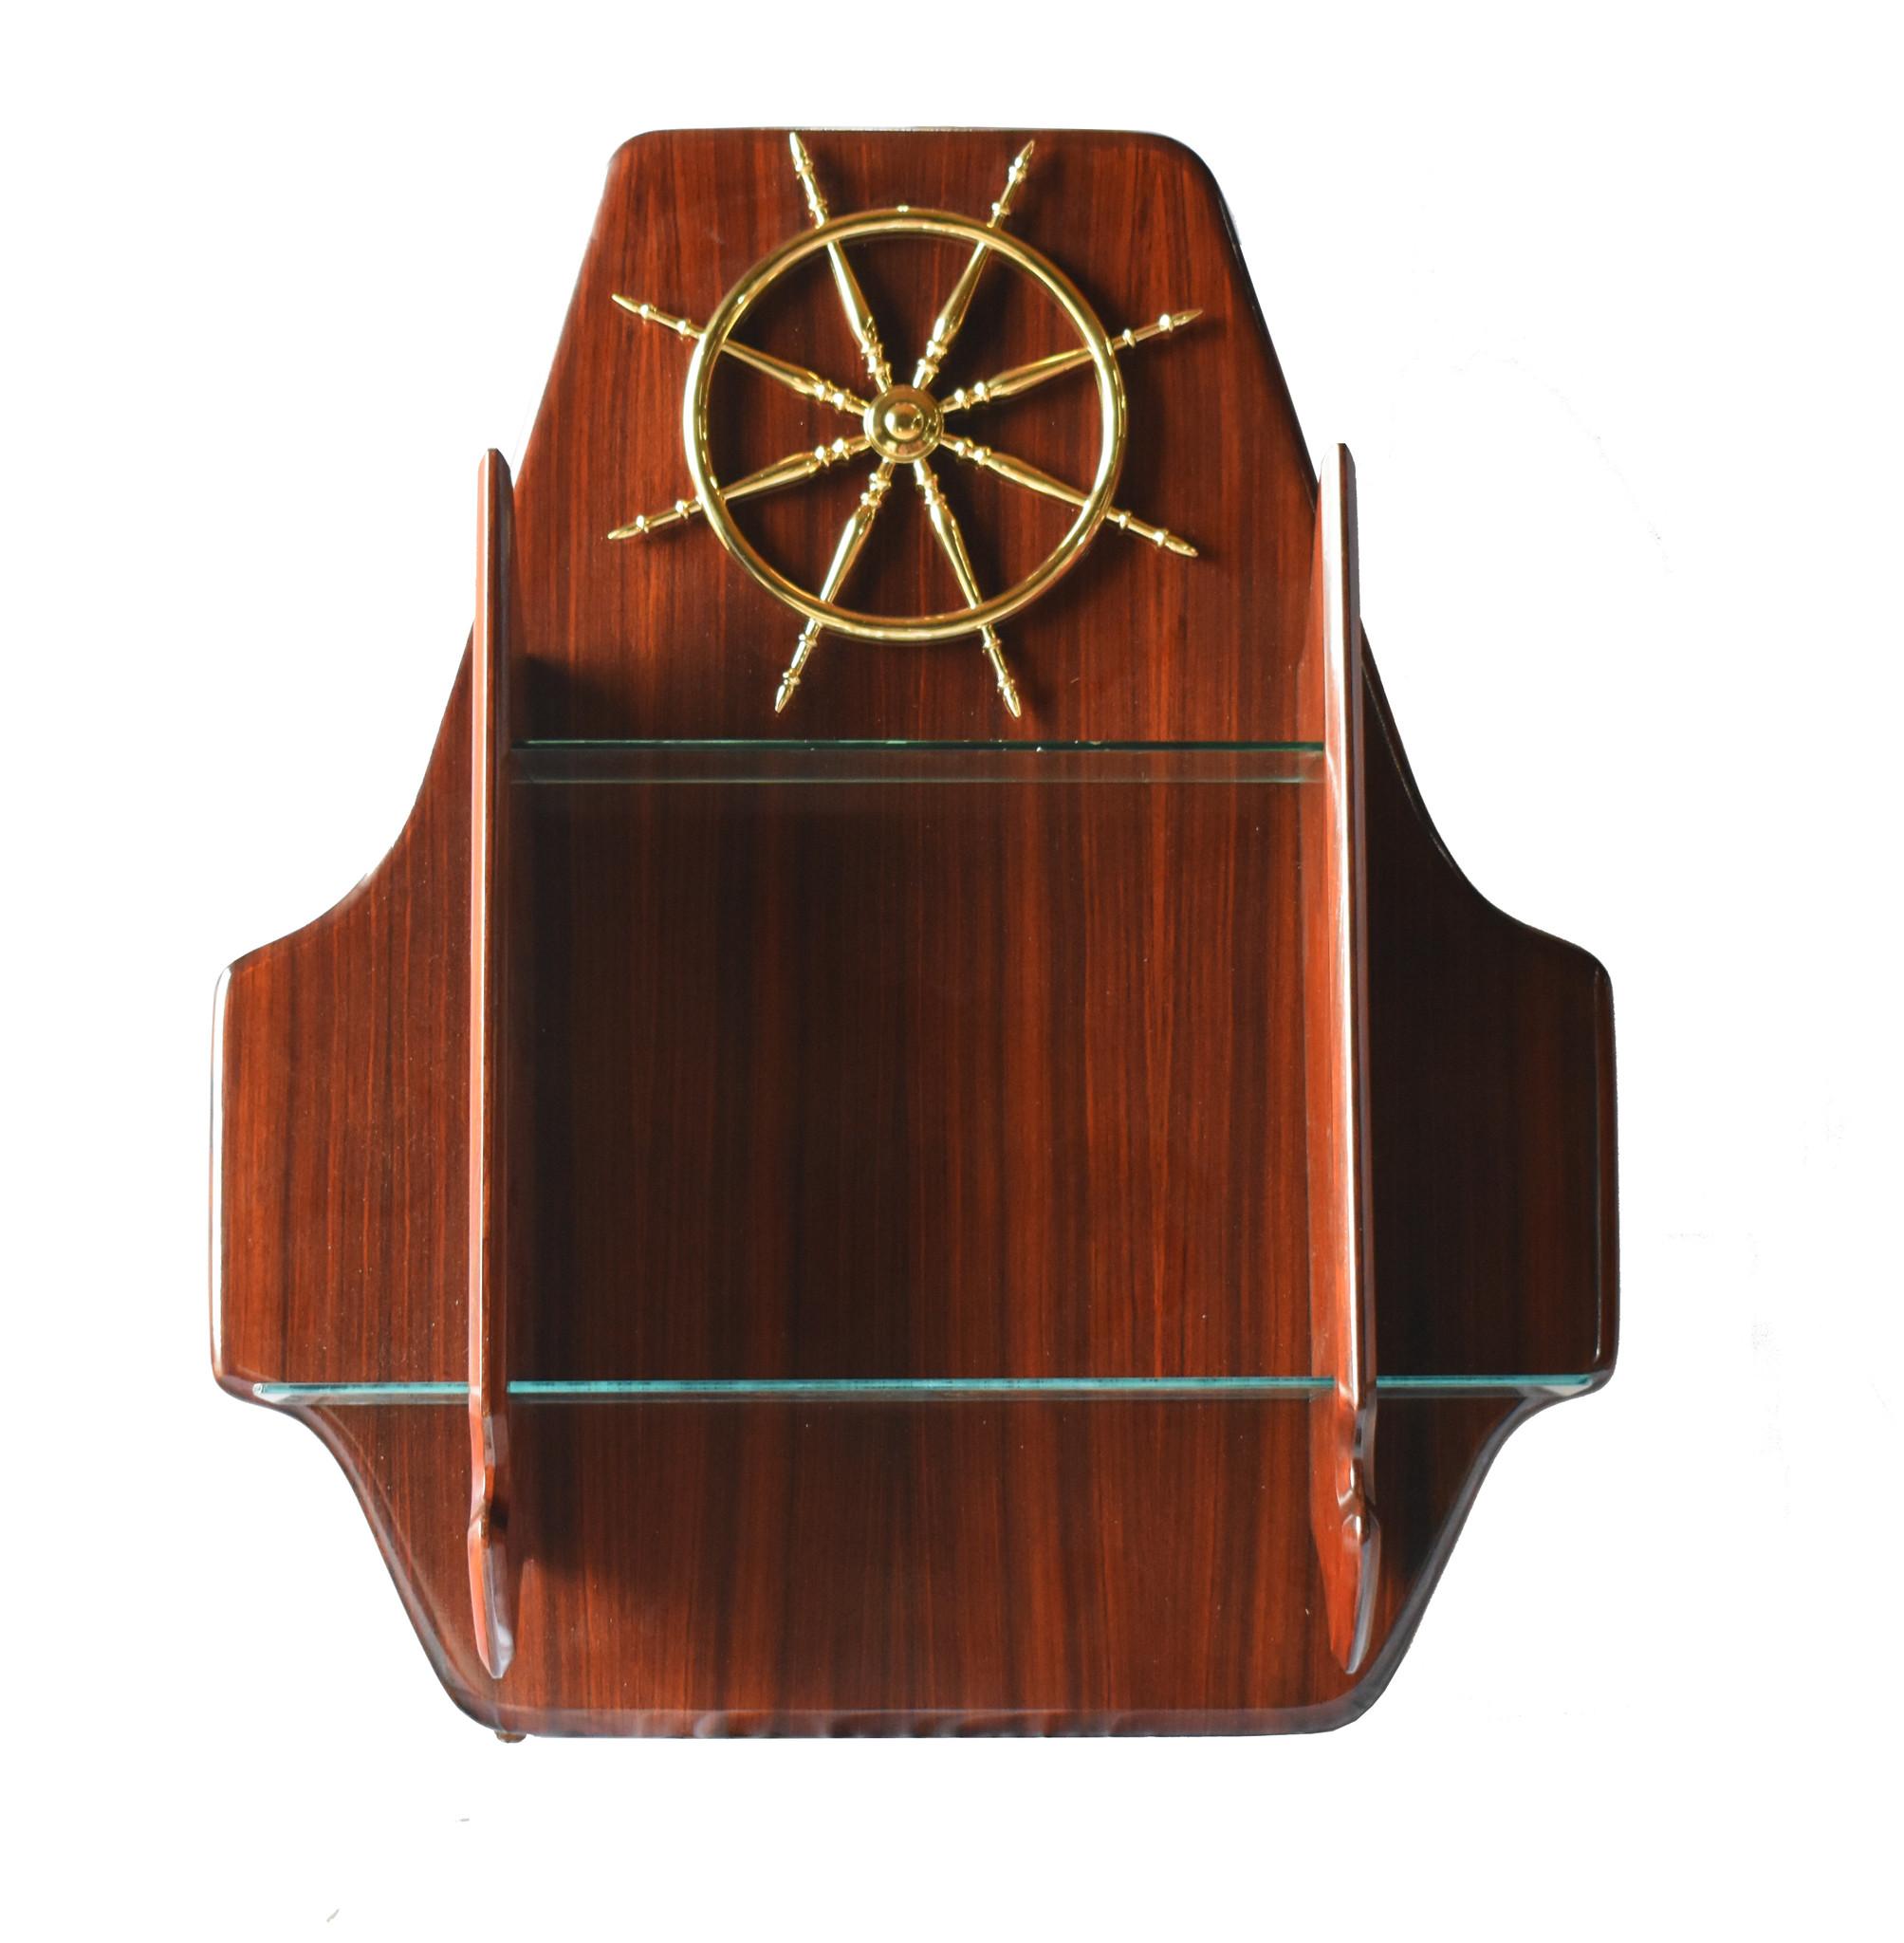 Italian Rosewood & Brass Bar Shelf & Cabinet with Stools